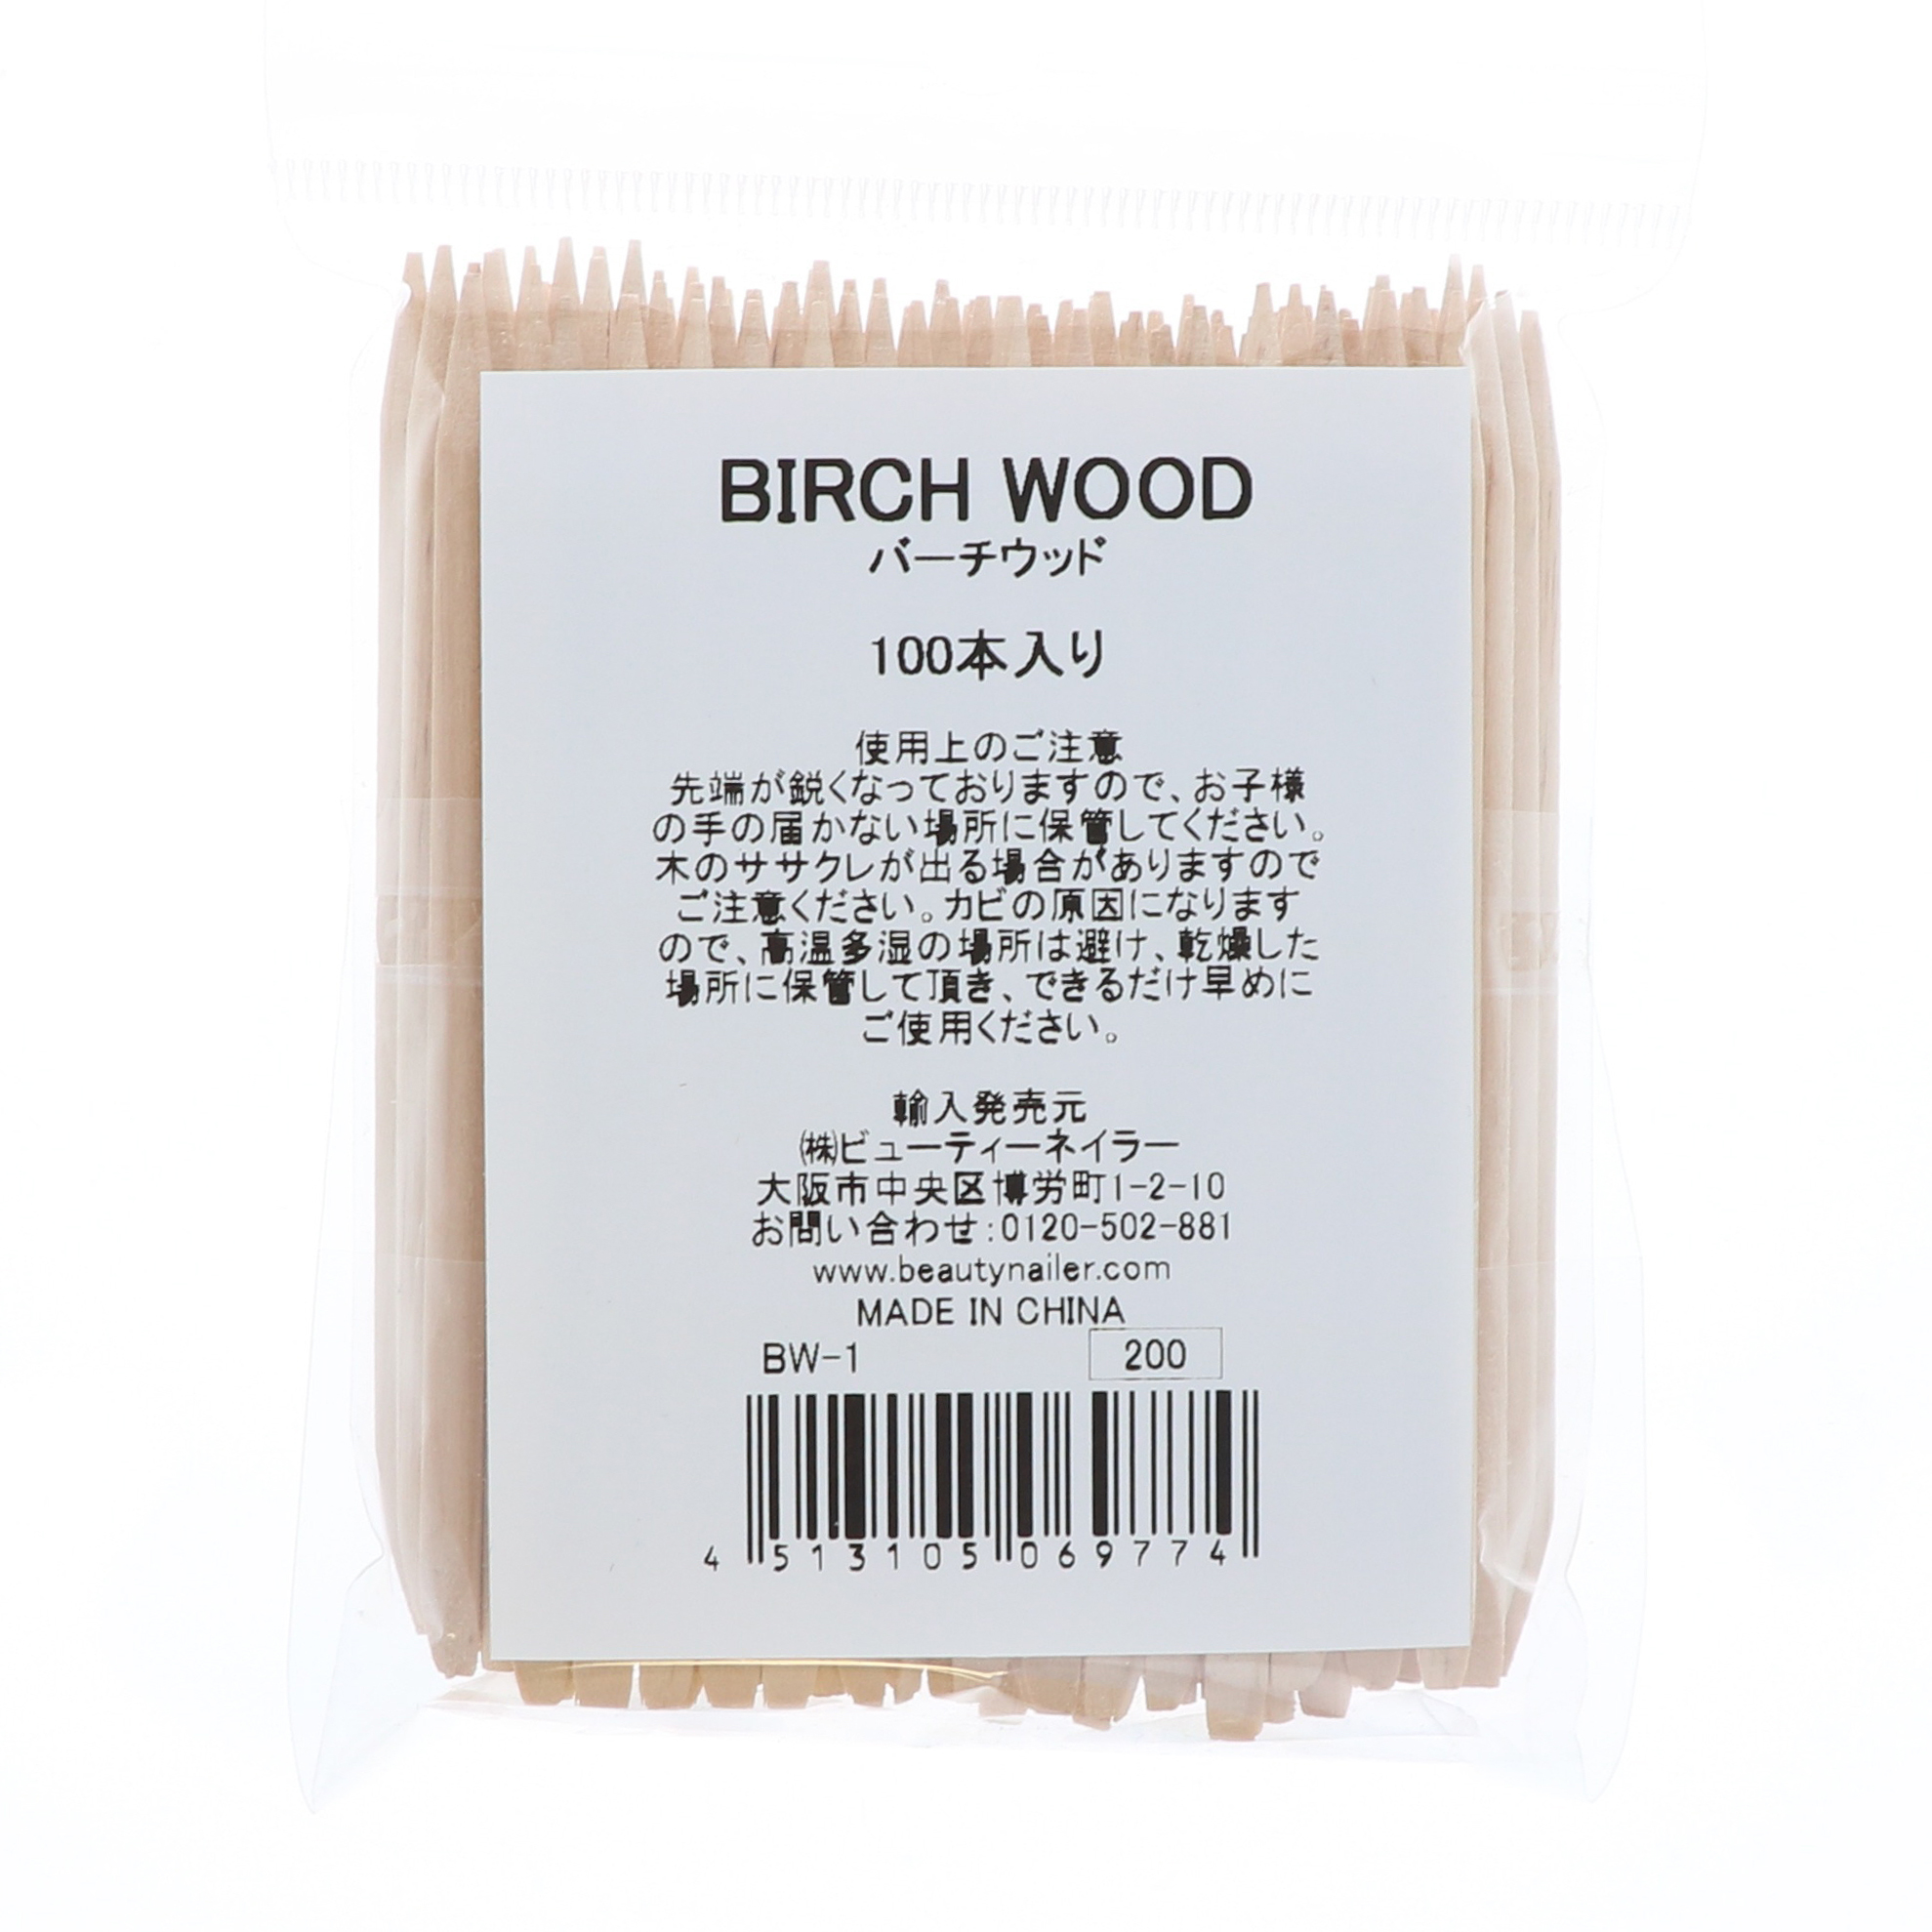 BIRCH WOOD バーチウッド100本入り画像